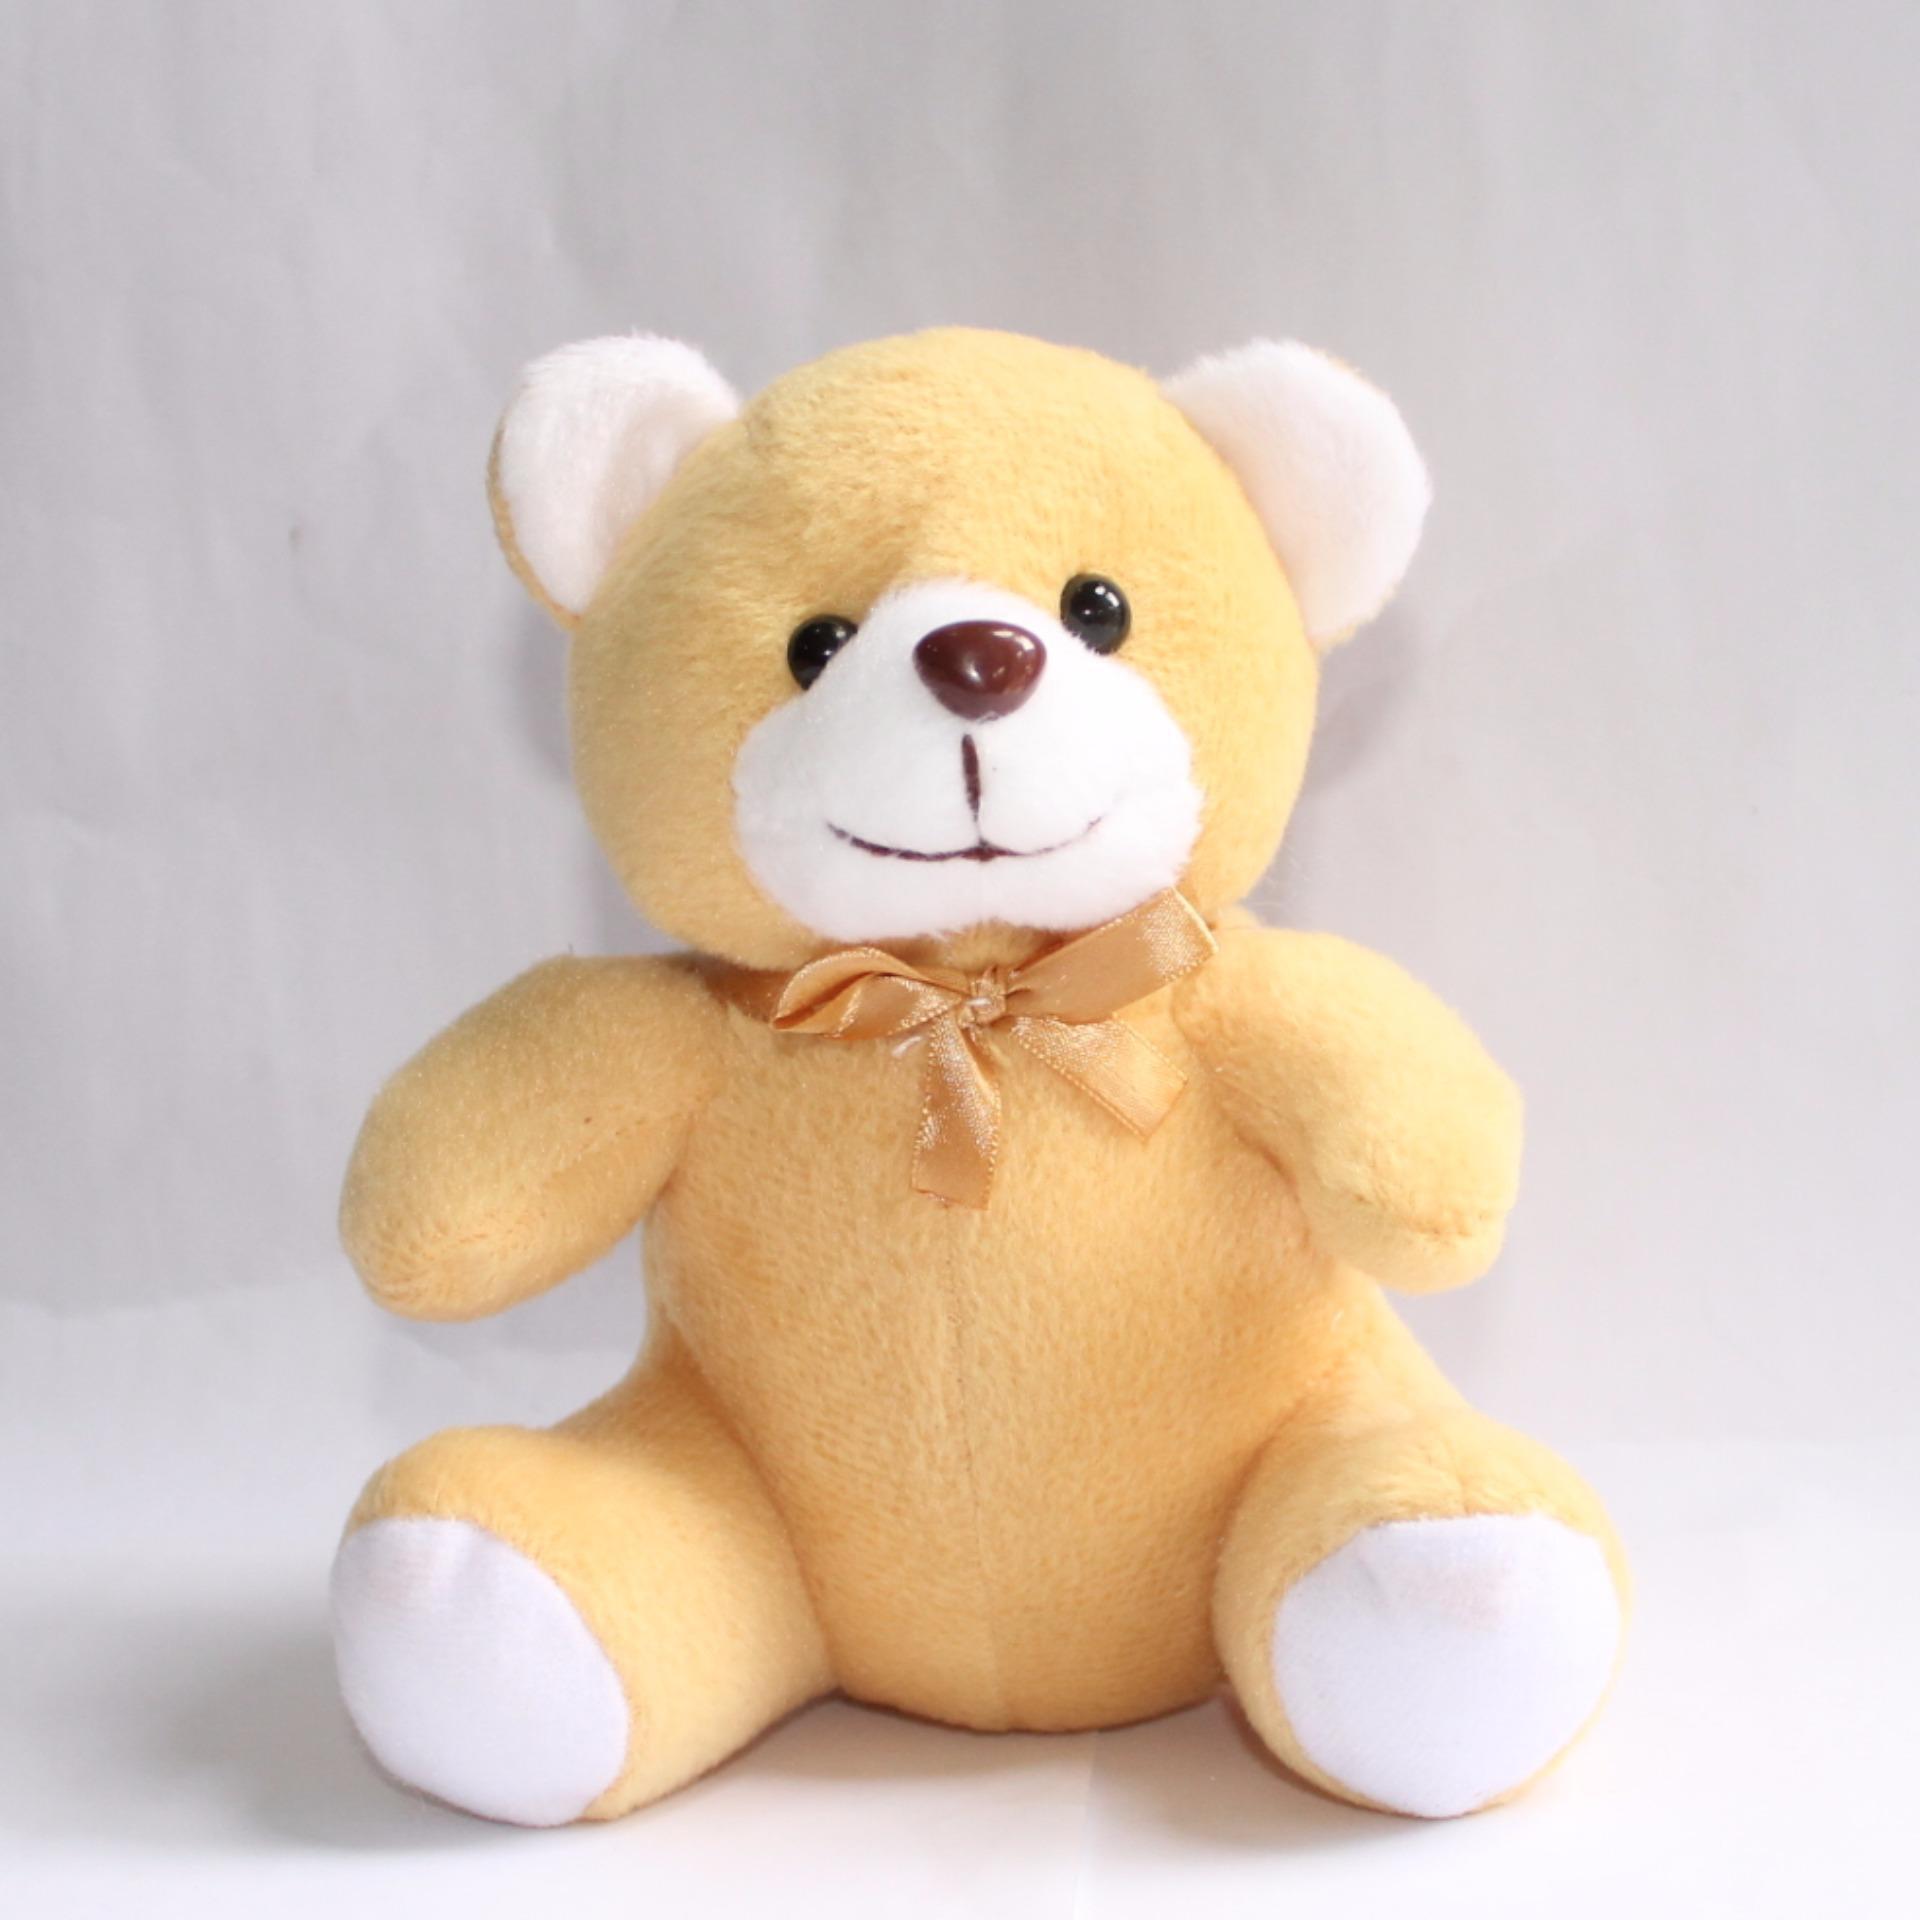 ... Boneka Mini Lucu dan Imut Berkualitas Tinggi Murah. Source.   Jual  Mainan . fe1280d4a5